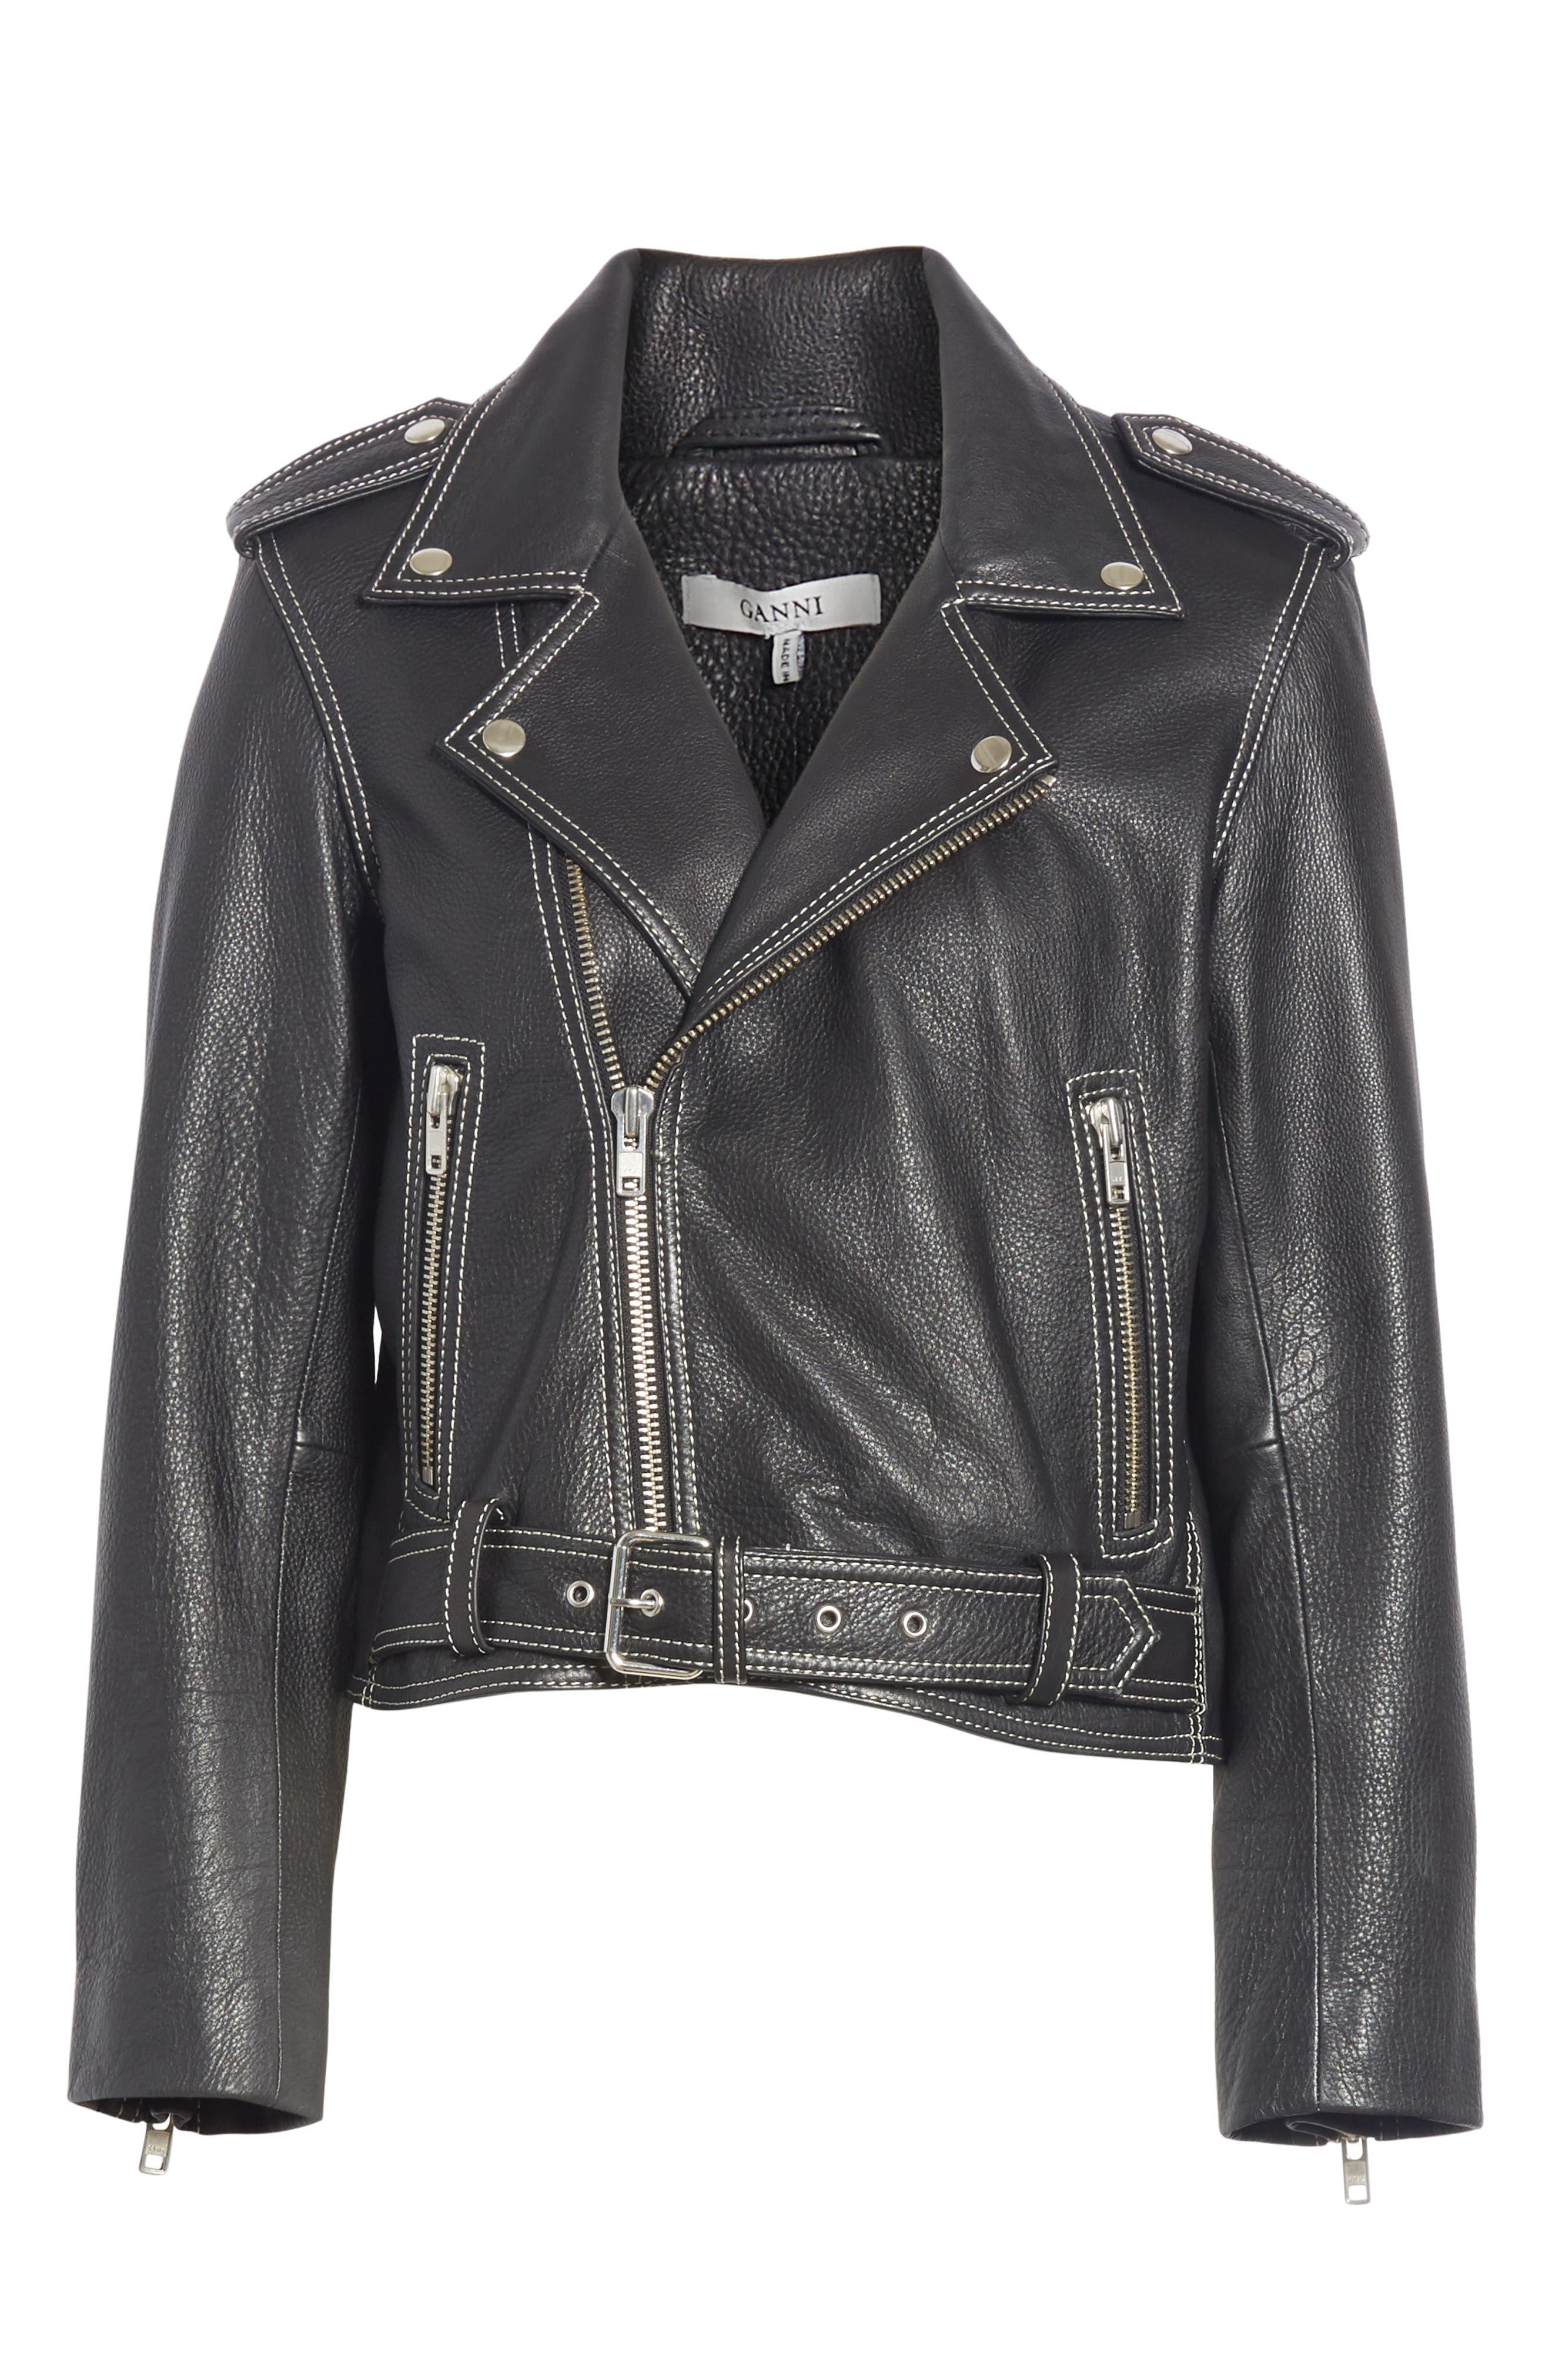 GANNI,                             Angela Leather Jacket,                             Alternate thumbnail 5, color,                             099